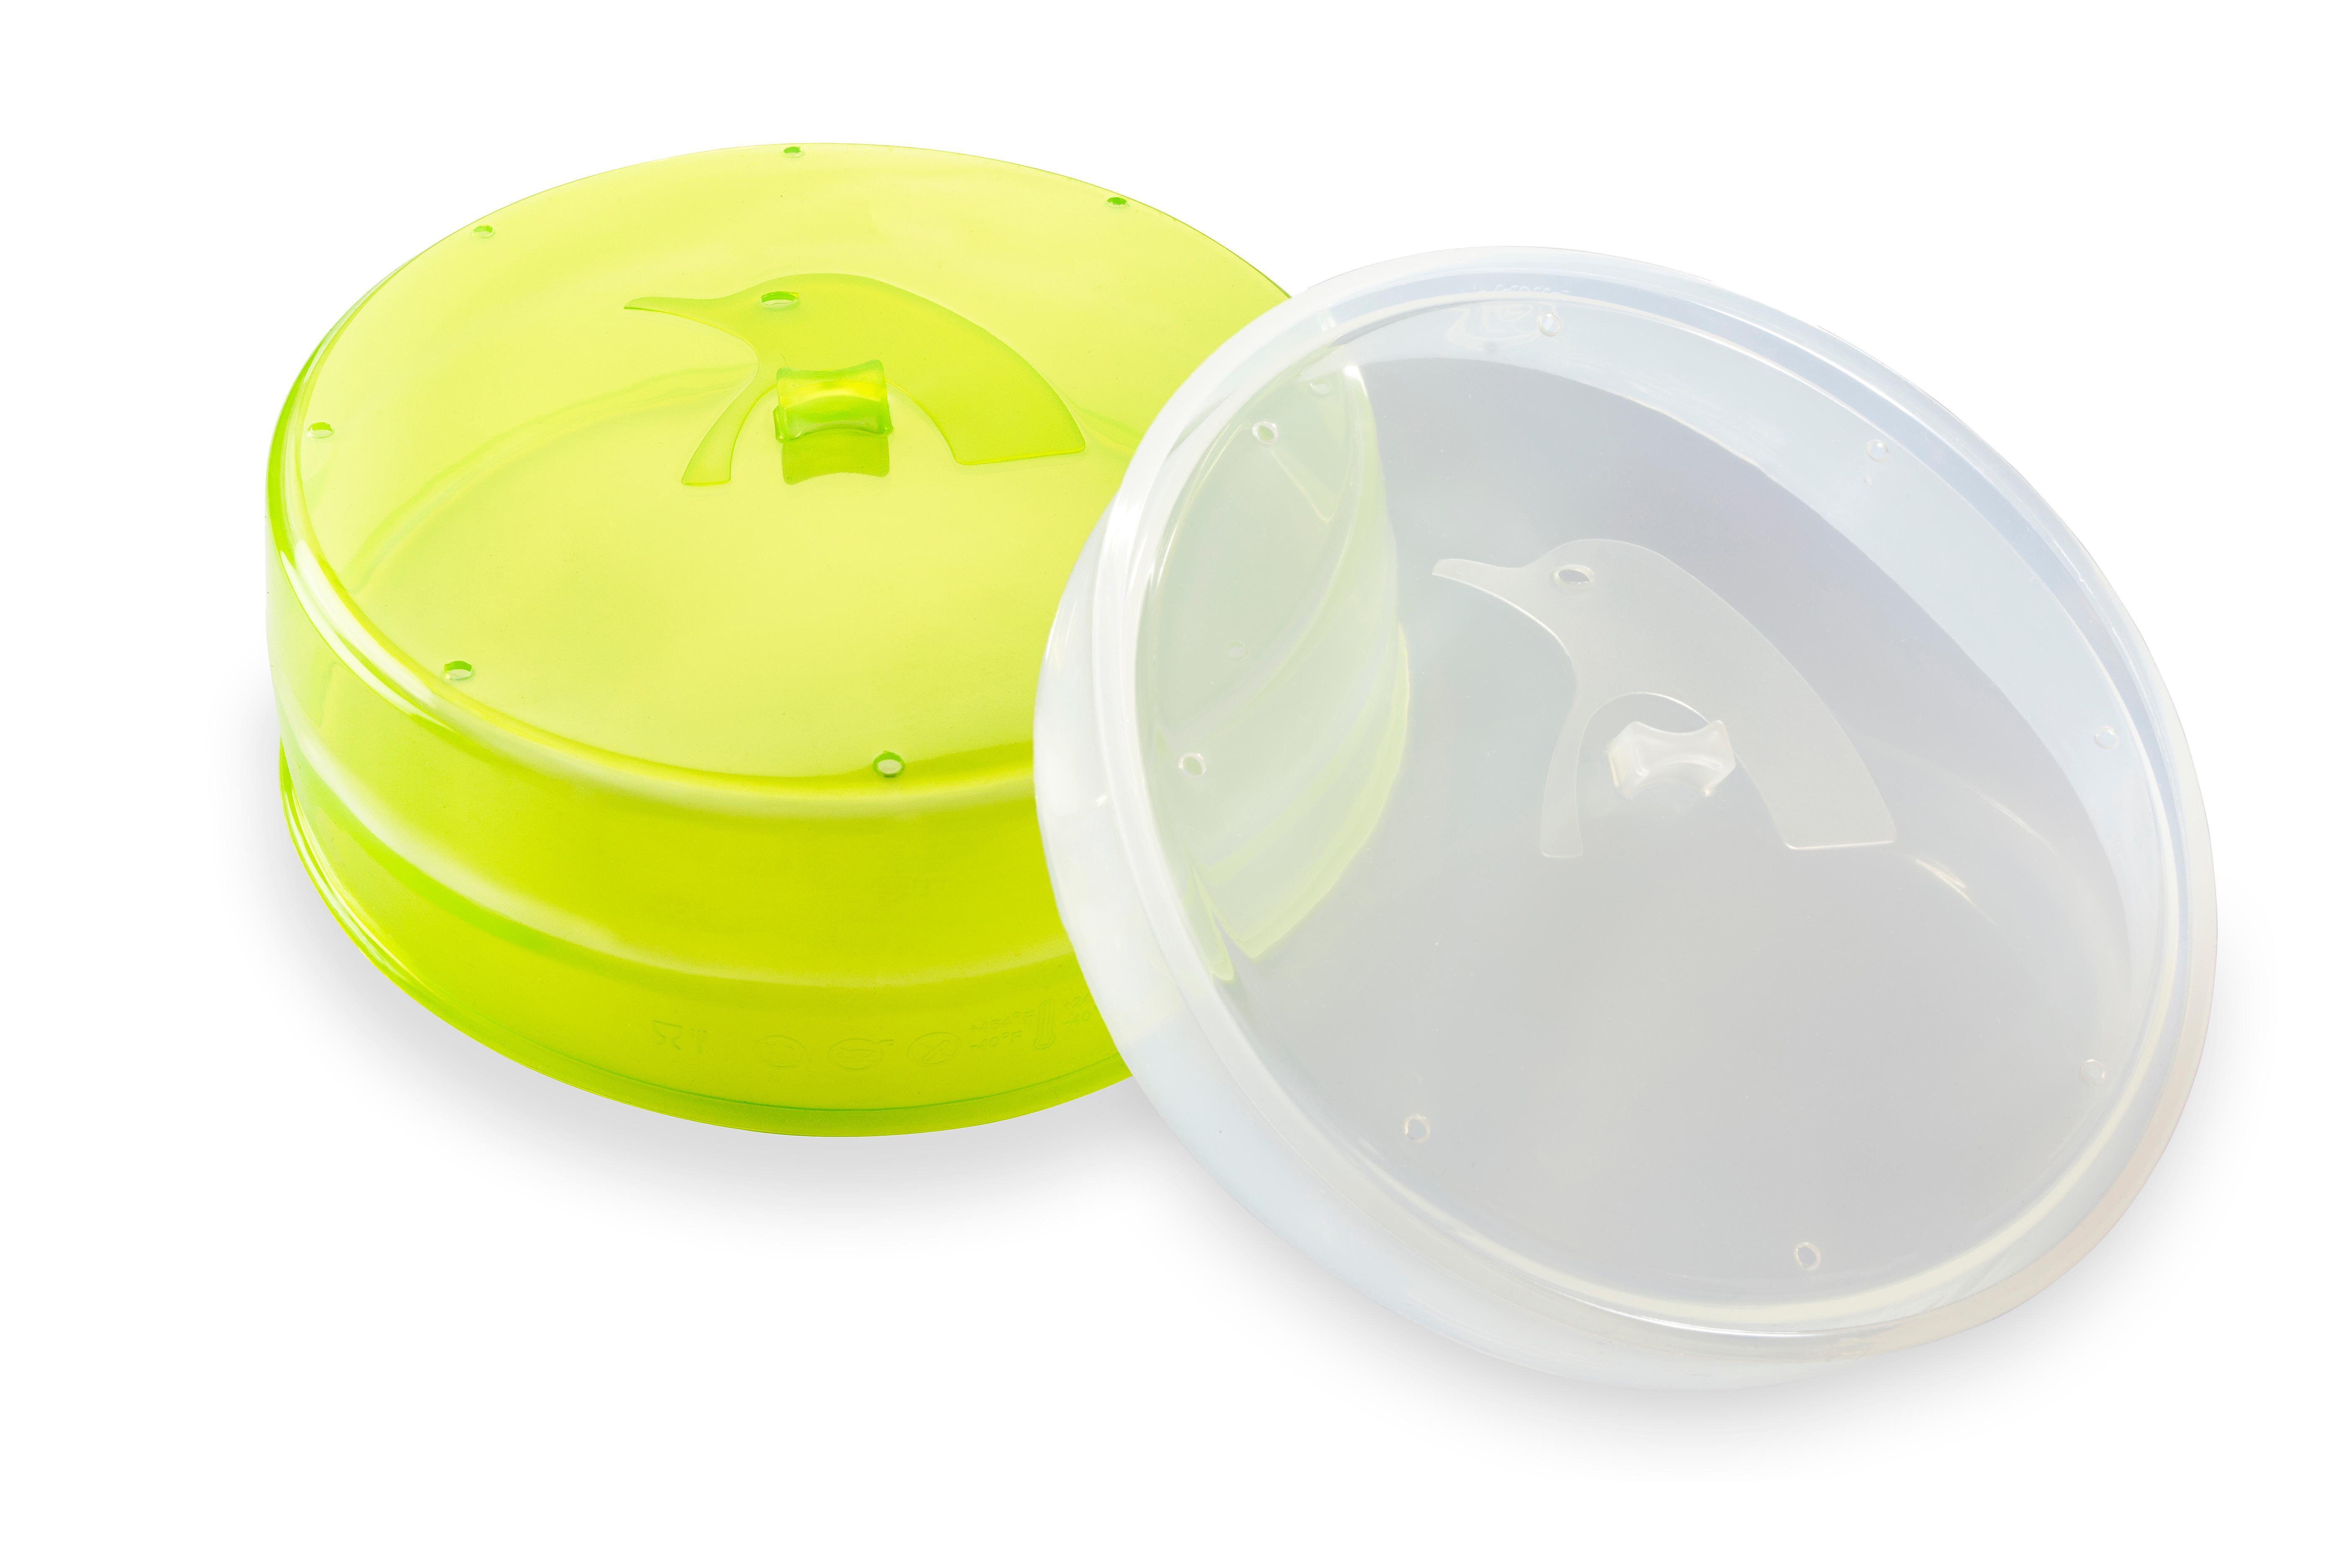 10€ Silicona transparente, Tapa microondas | artilugios | Pinterest ...